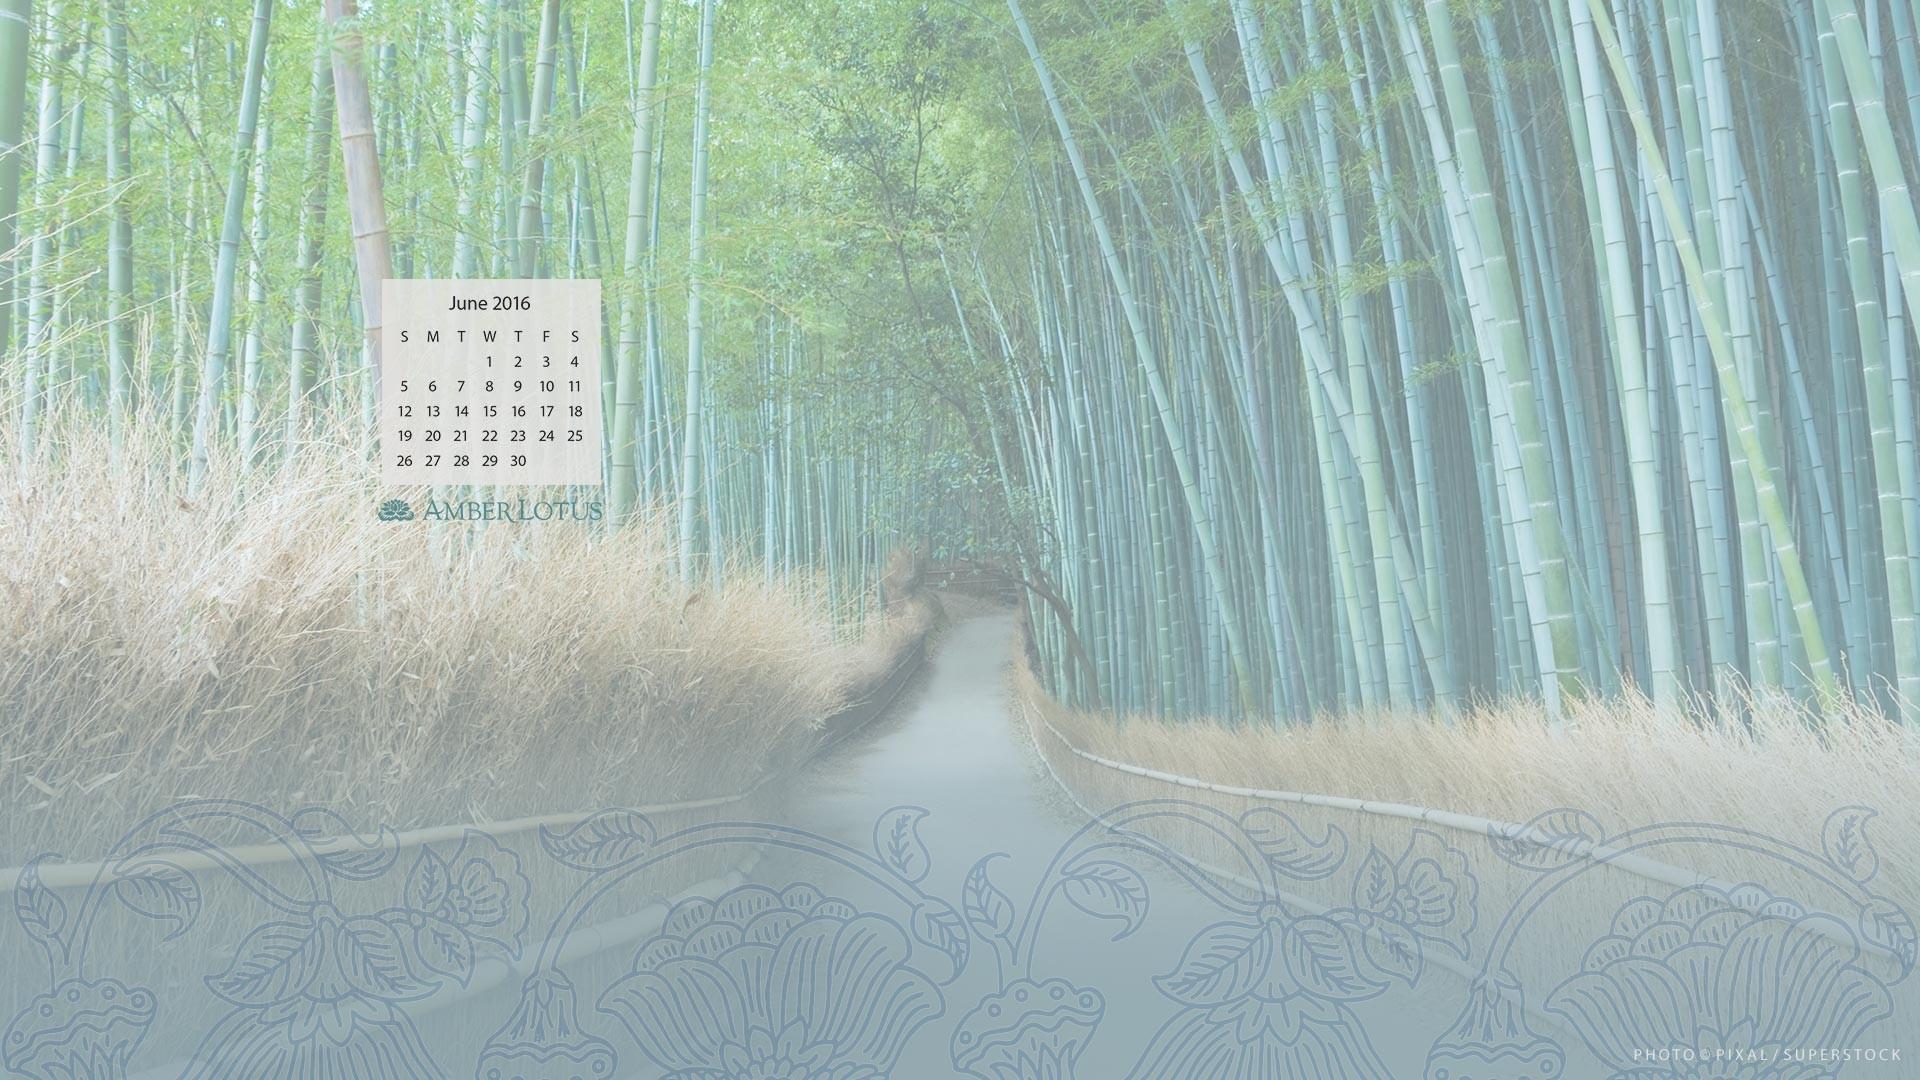 Calendar In Wallpaper : Wallpaper calendars for  images